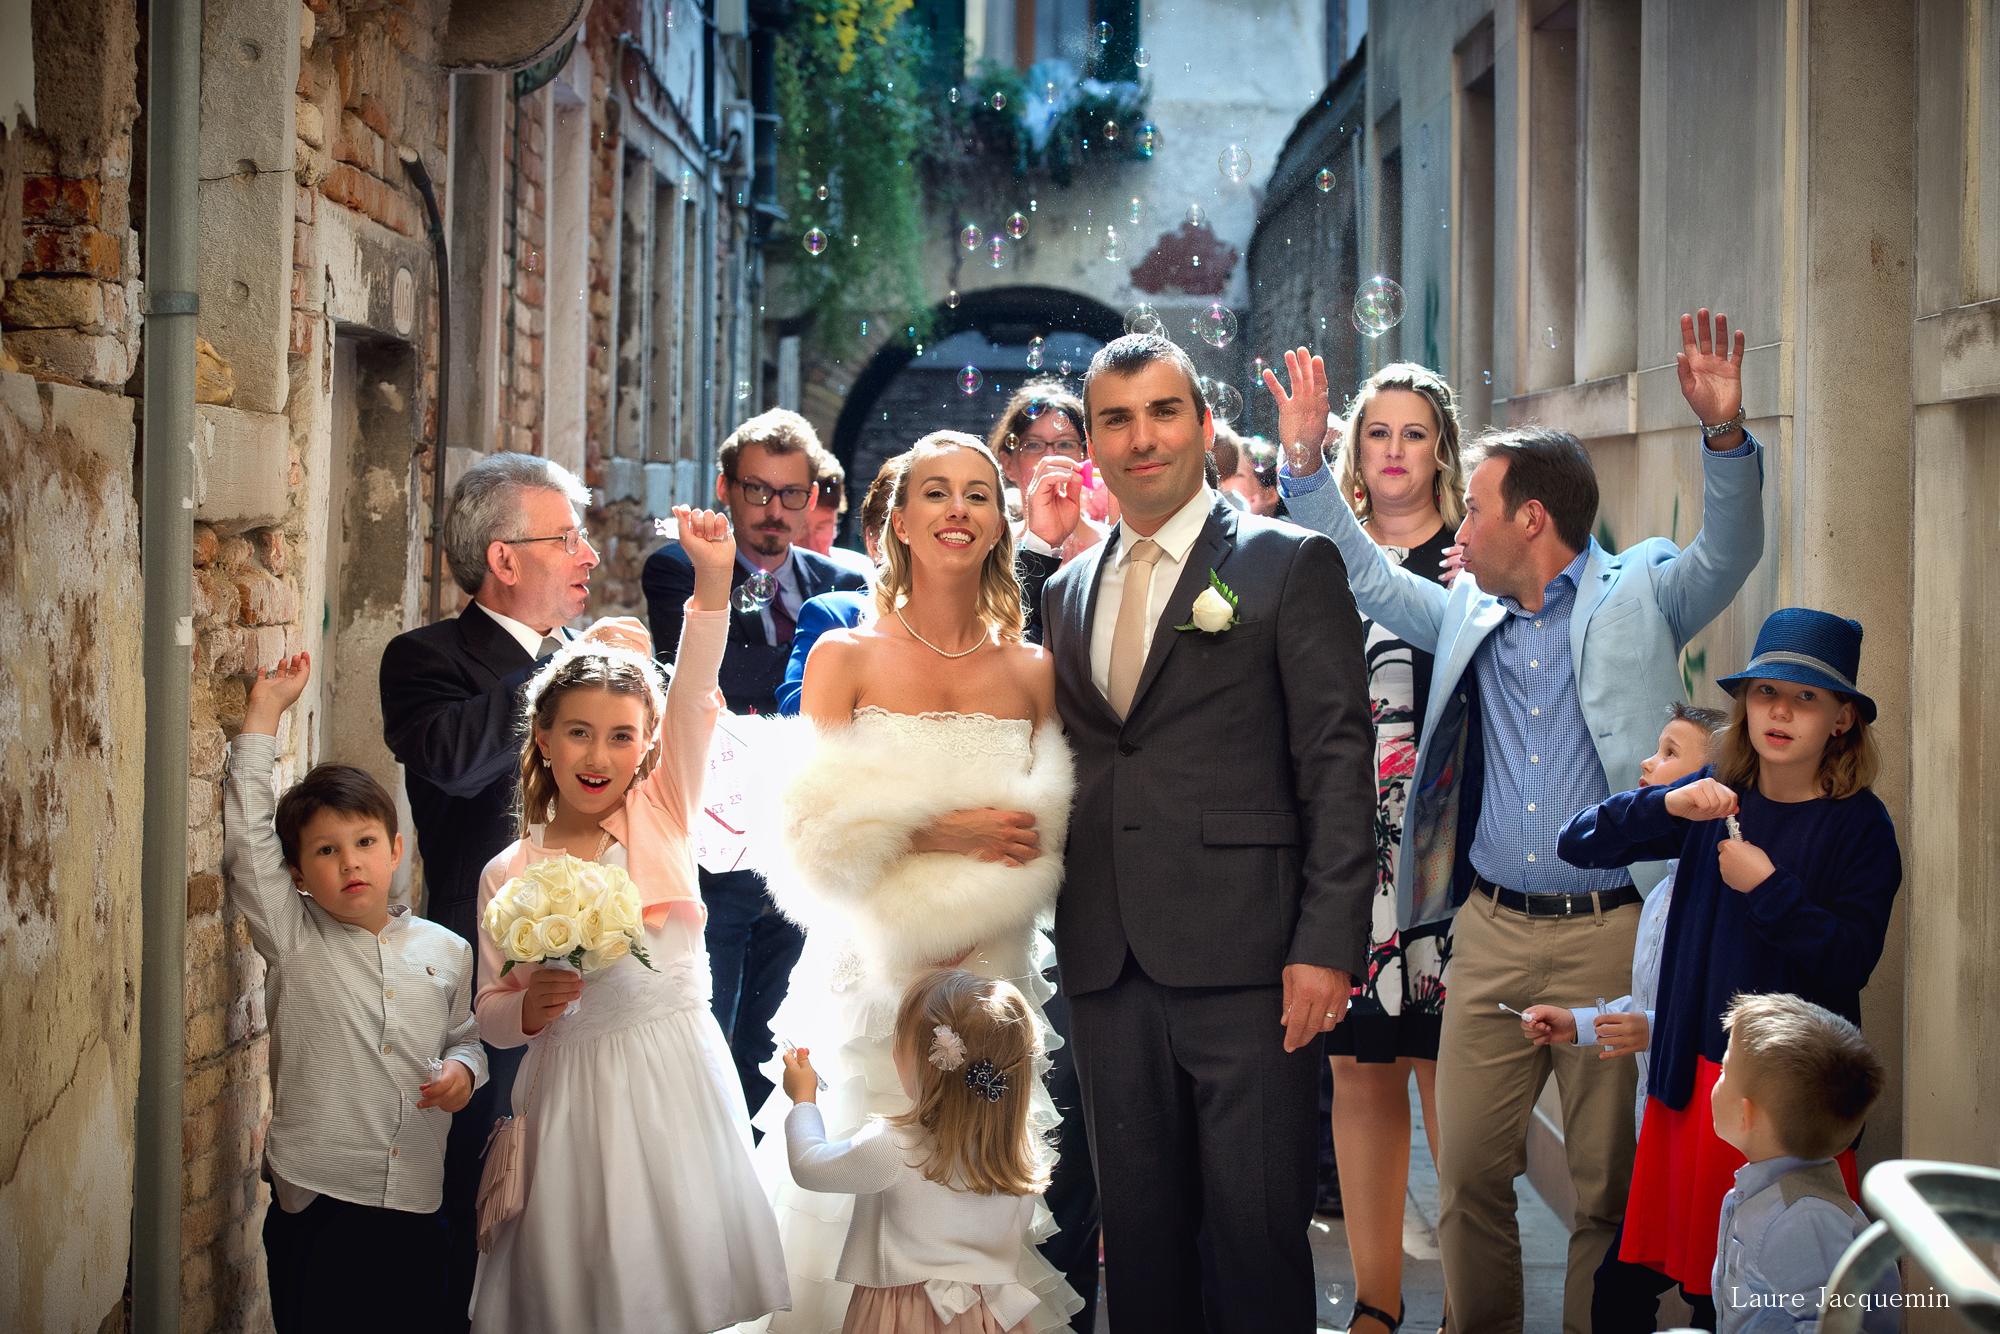 Mariage venise photographe gondole palazzo cavalli  laure jacquemin  (33)